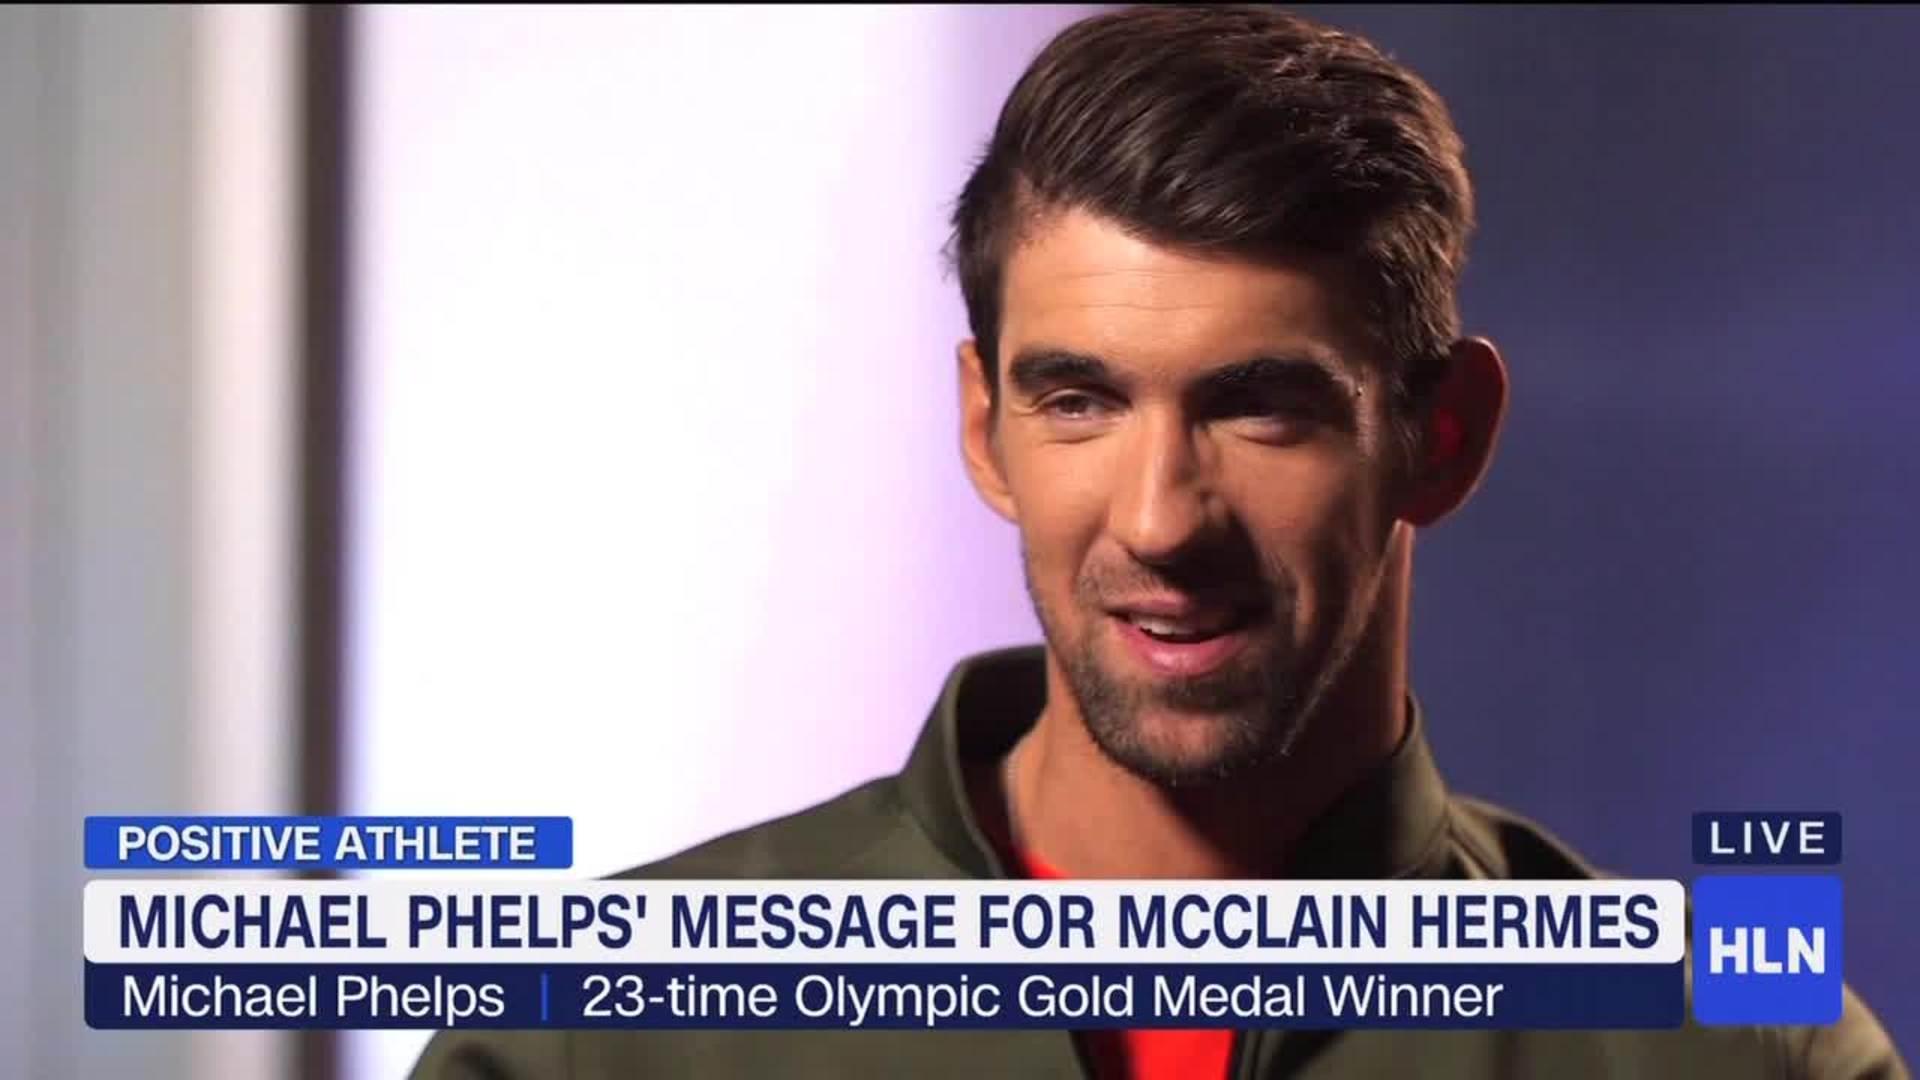 Positive Athlete: McClain Hermes - CNN Video